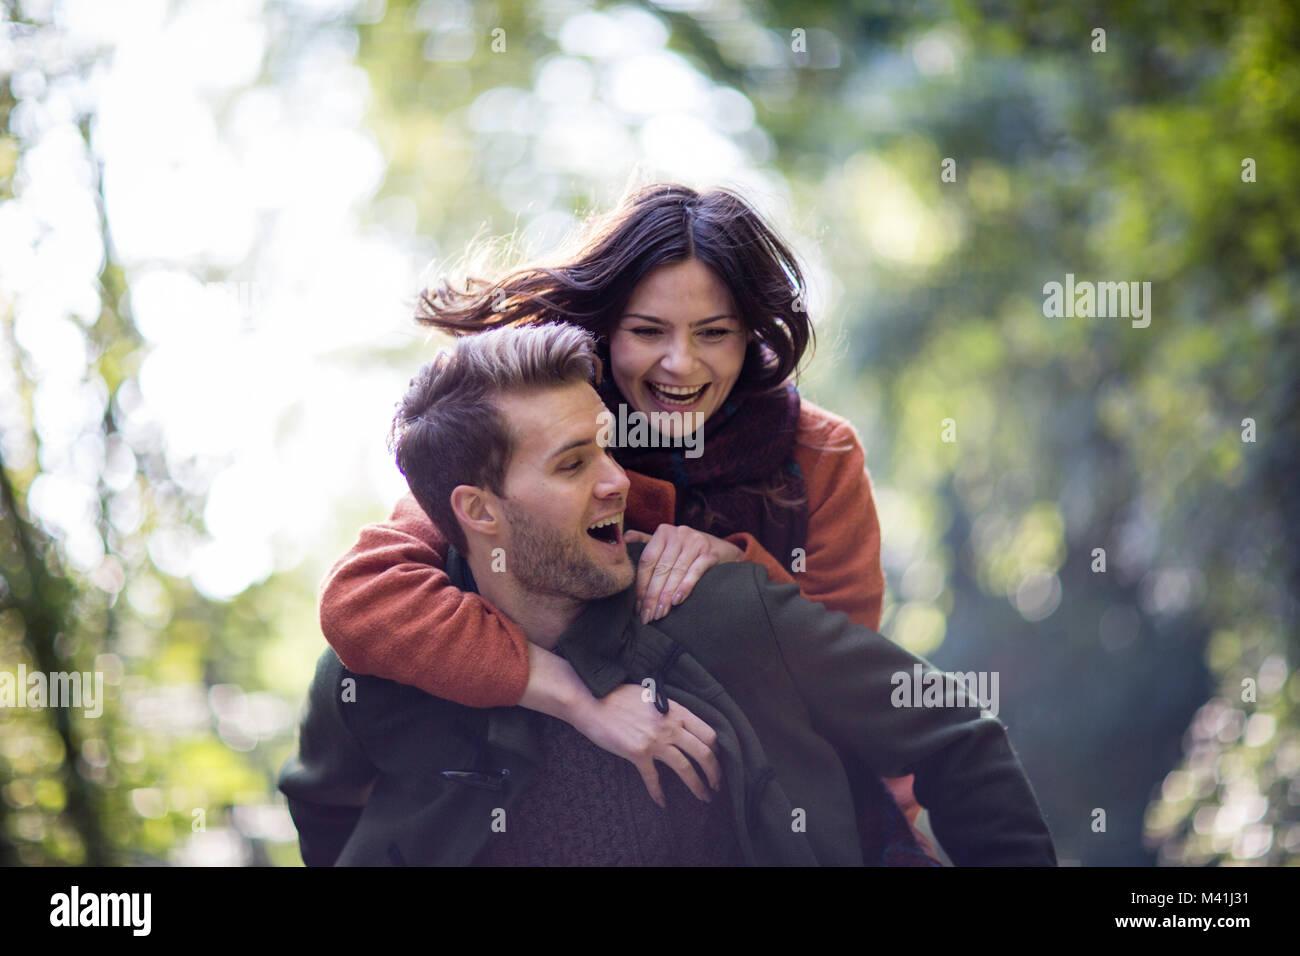 Couple having fun outdoors in autumn - Stock Image